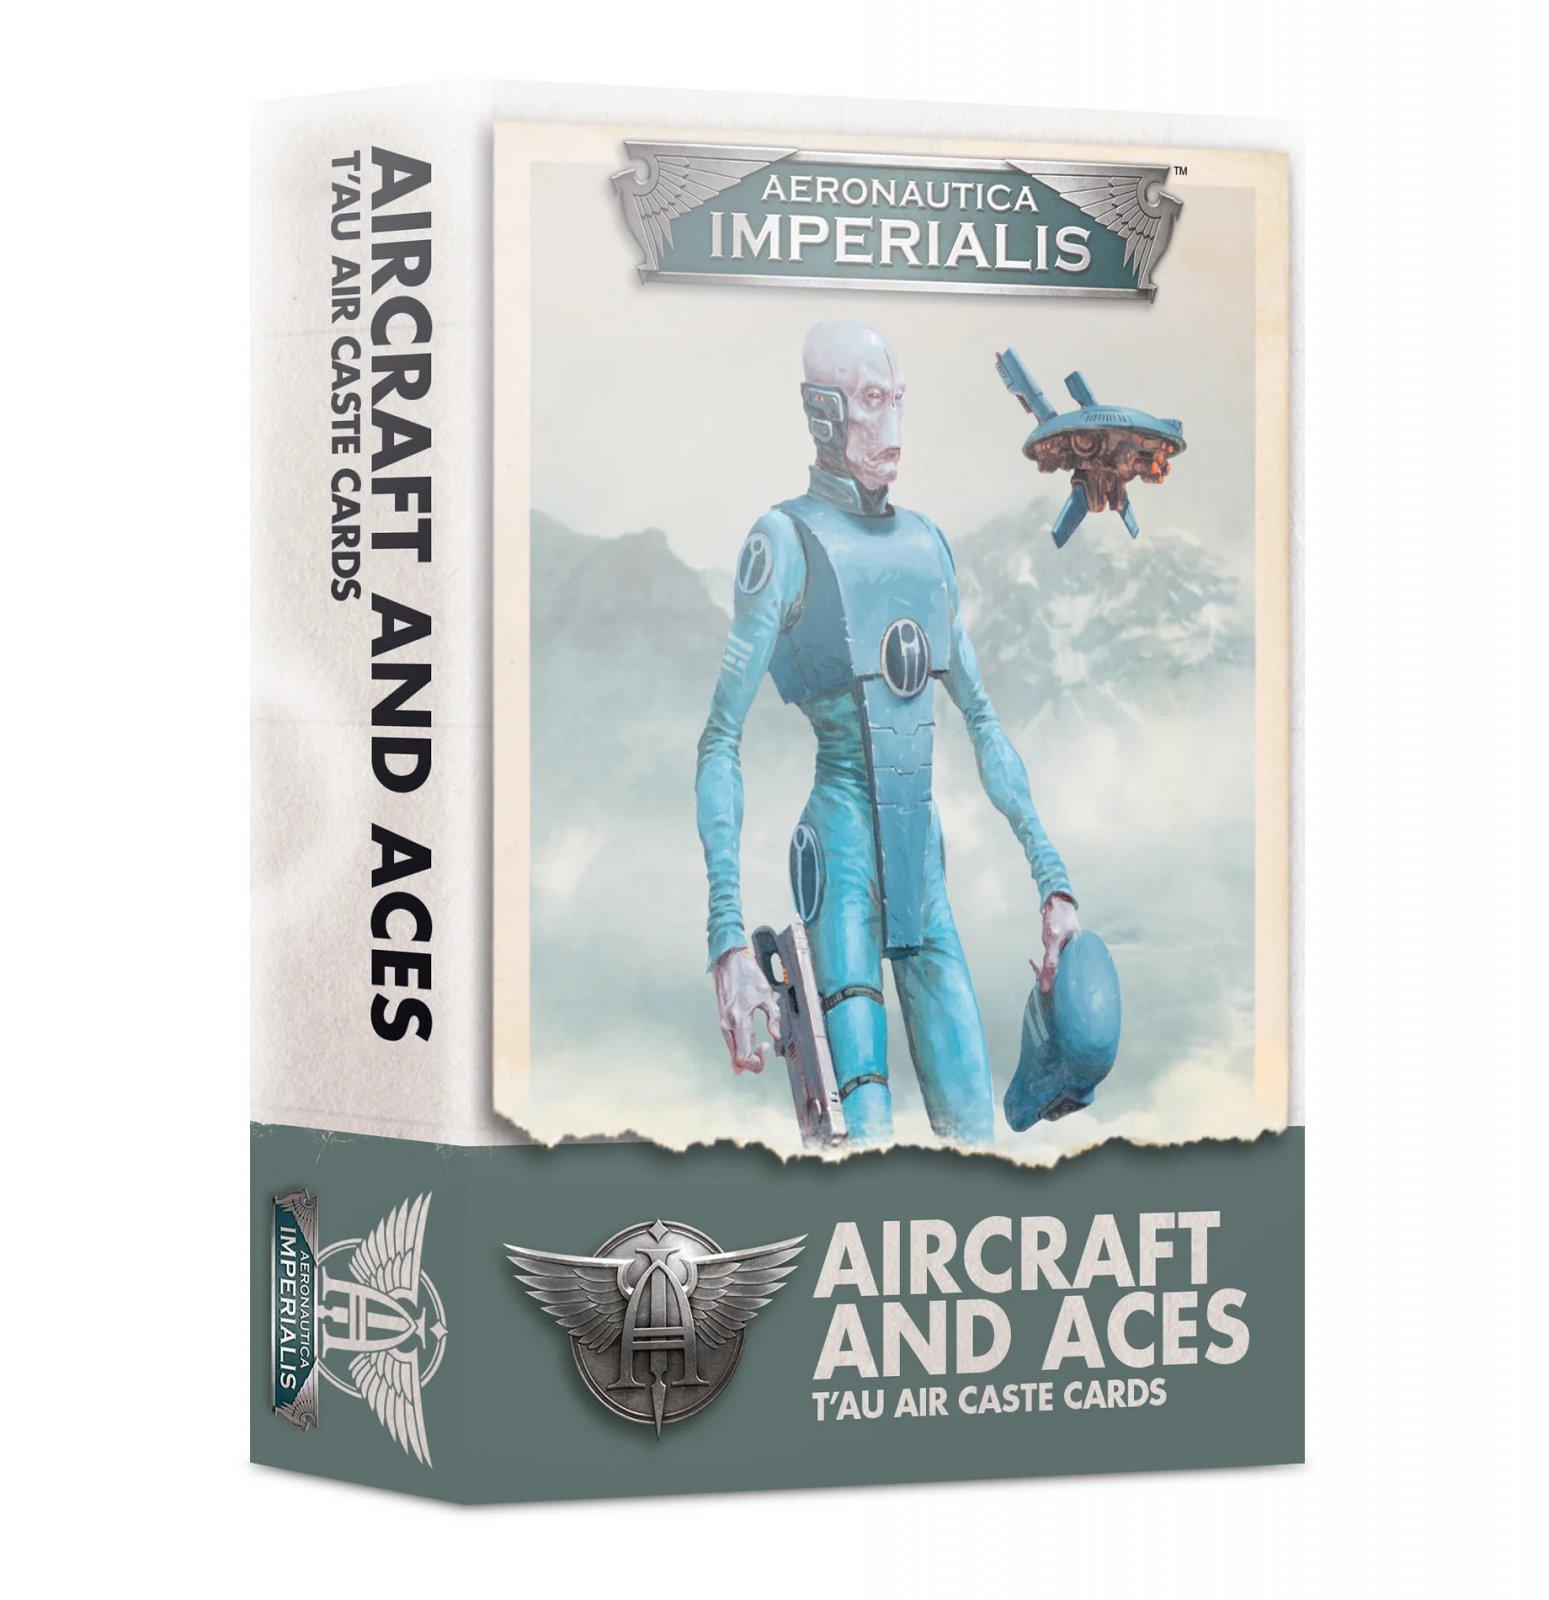 Aeronautica Imperialis: Aircraft & Aces T'Au Air Caste Cards